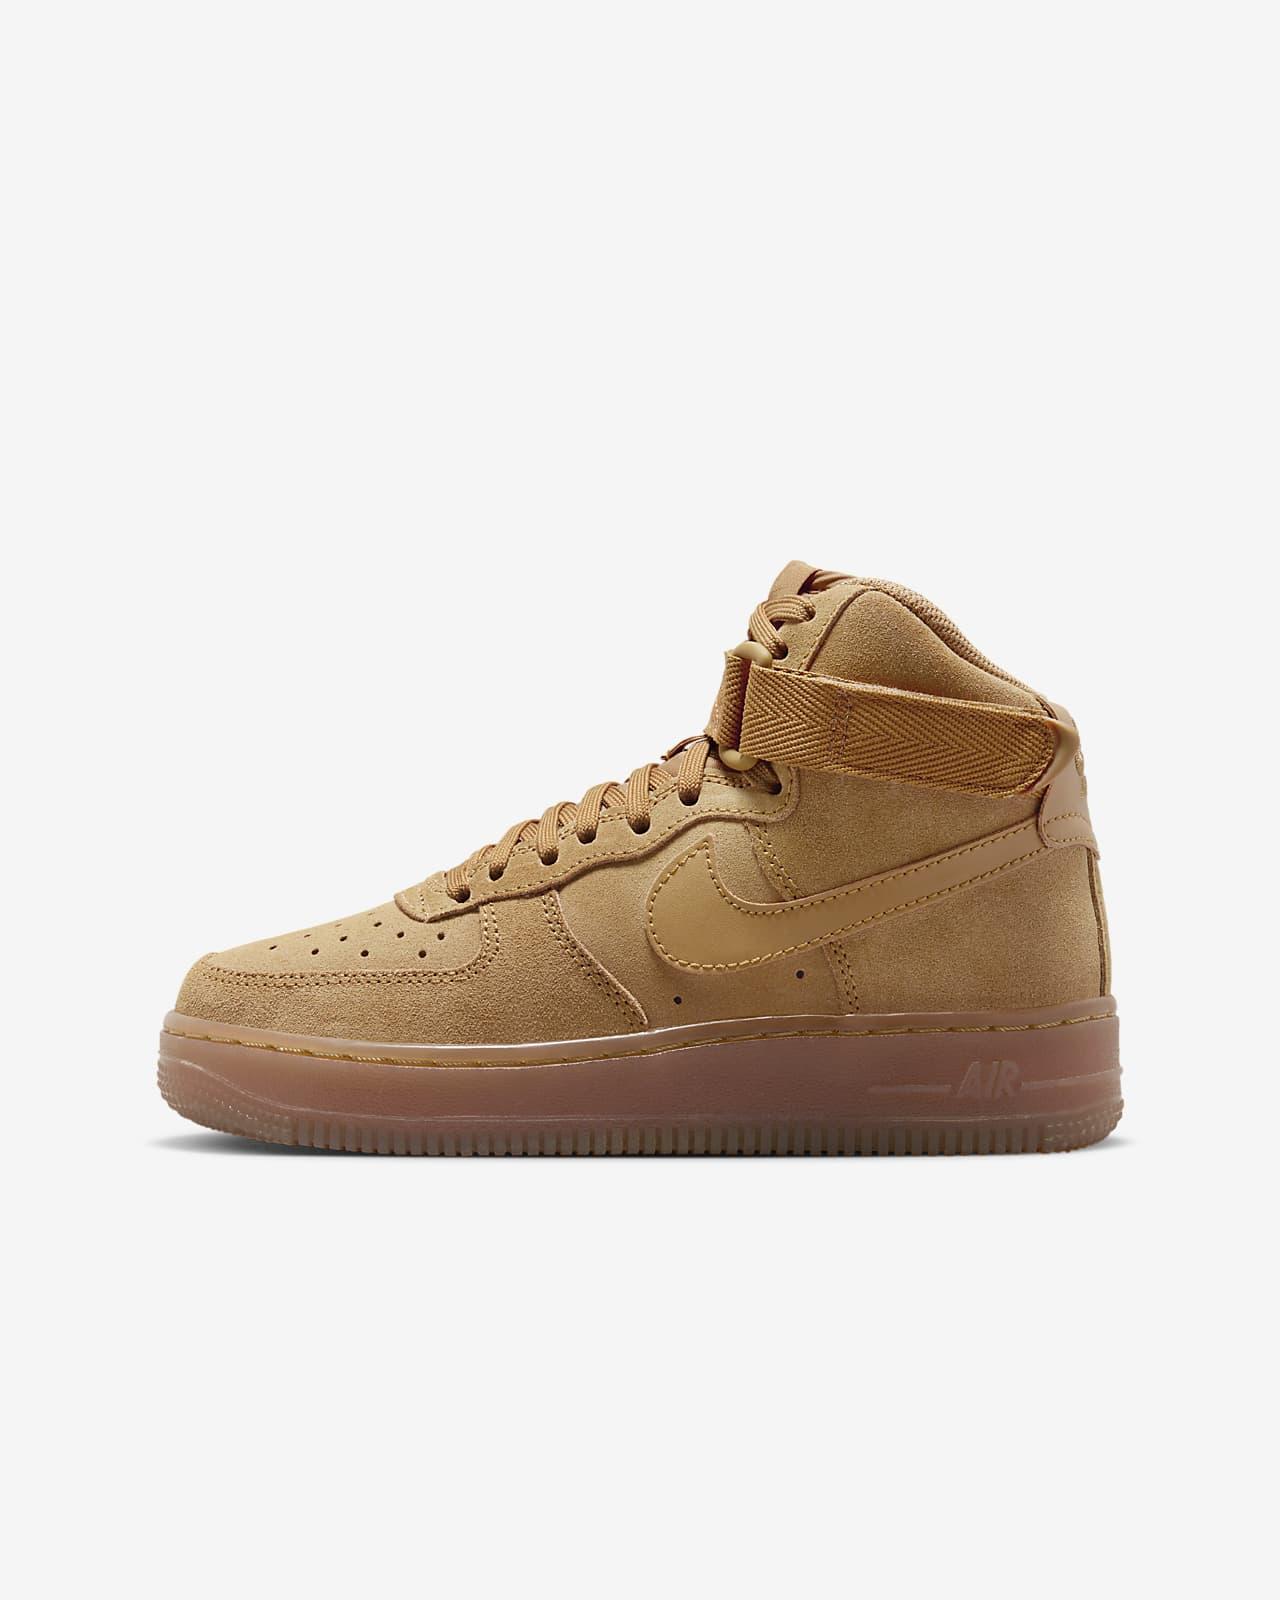 Nike Air Force 1 High LV8 3 Big Kids' Shoes